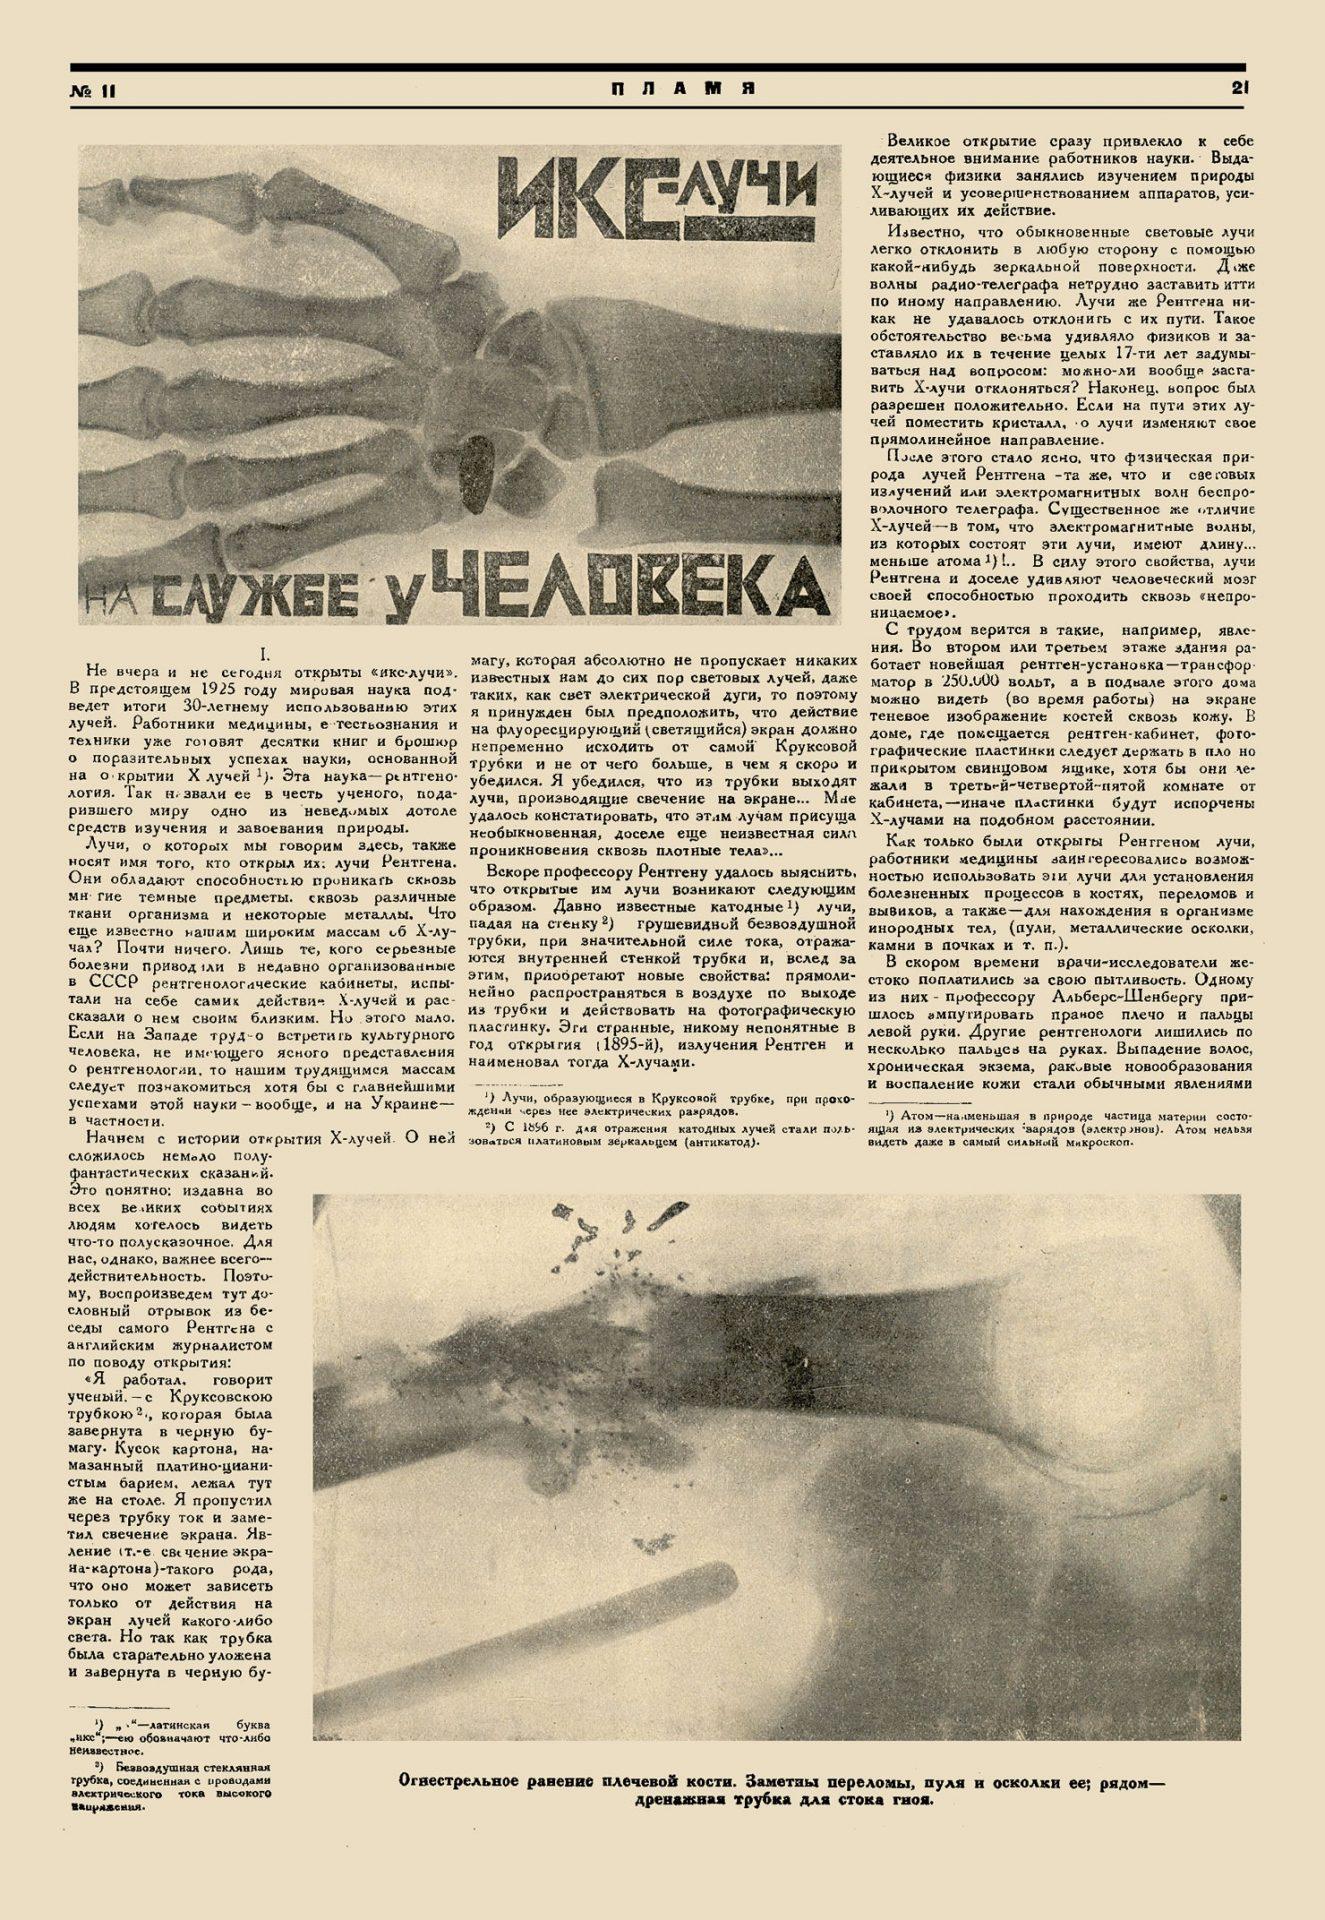 Пламя_1924_№11